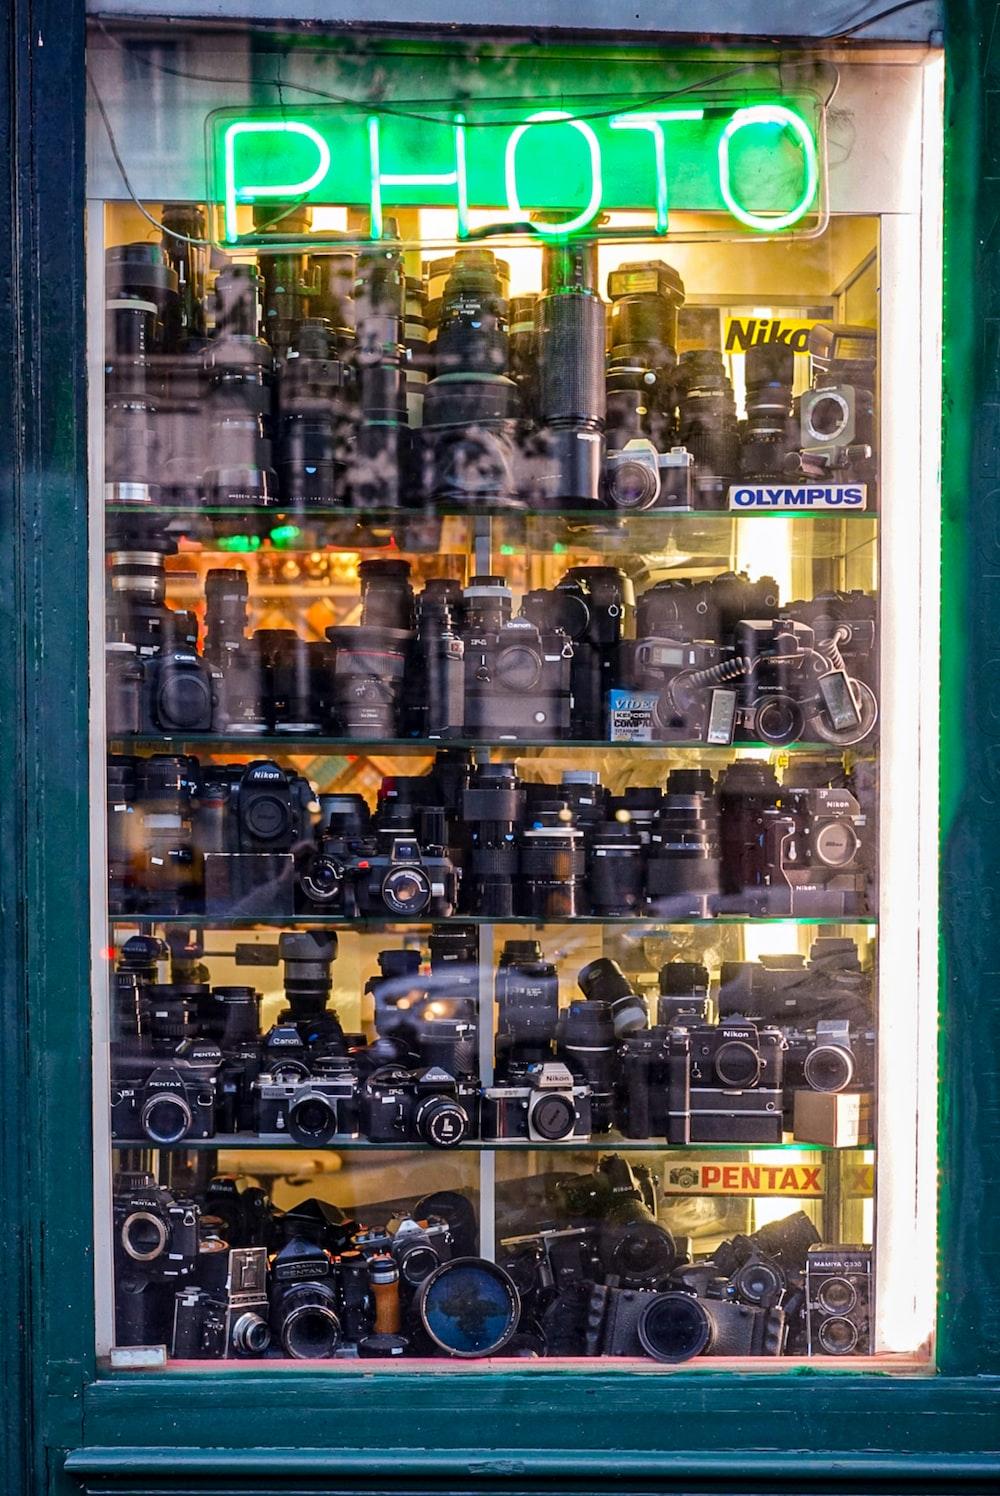 vintage cameras in display cabinet